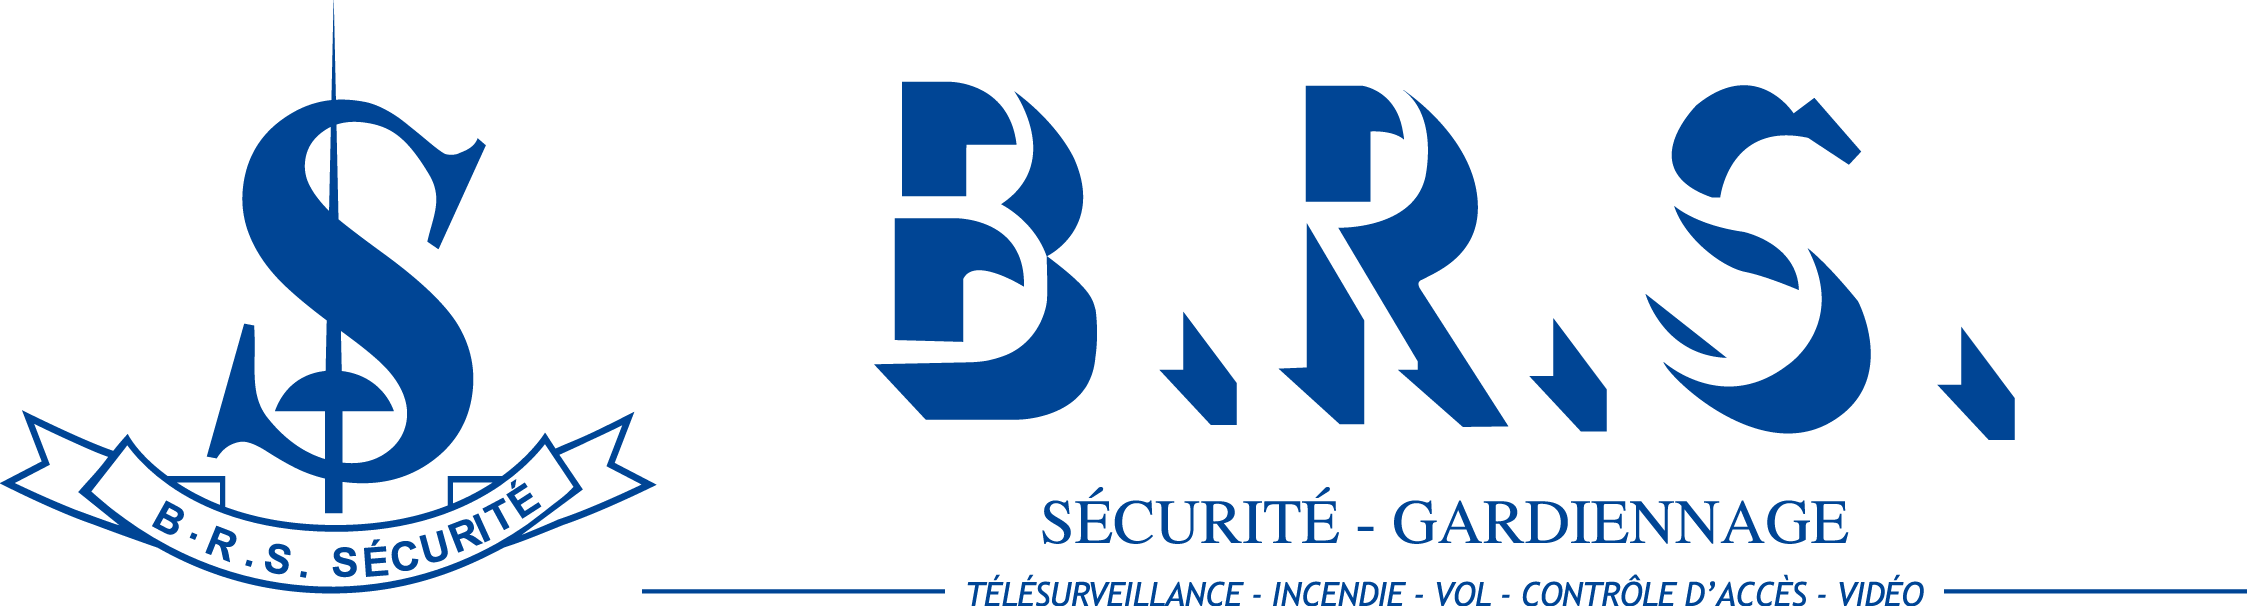 BRS-securite